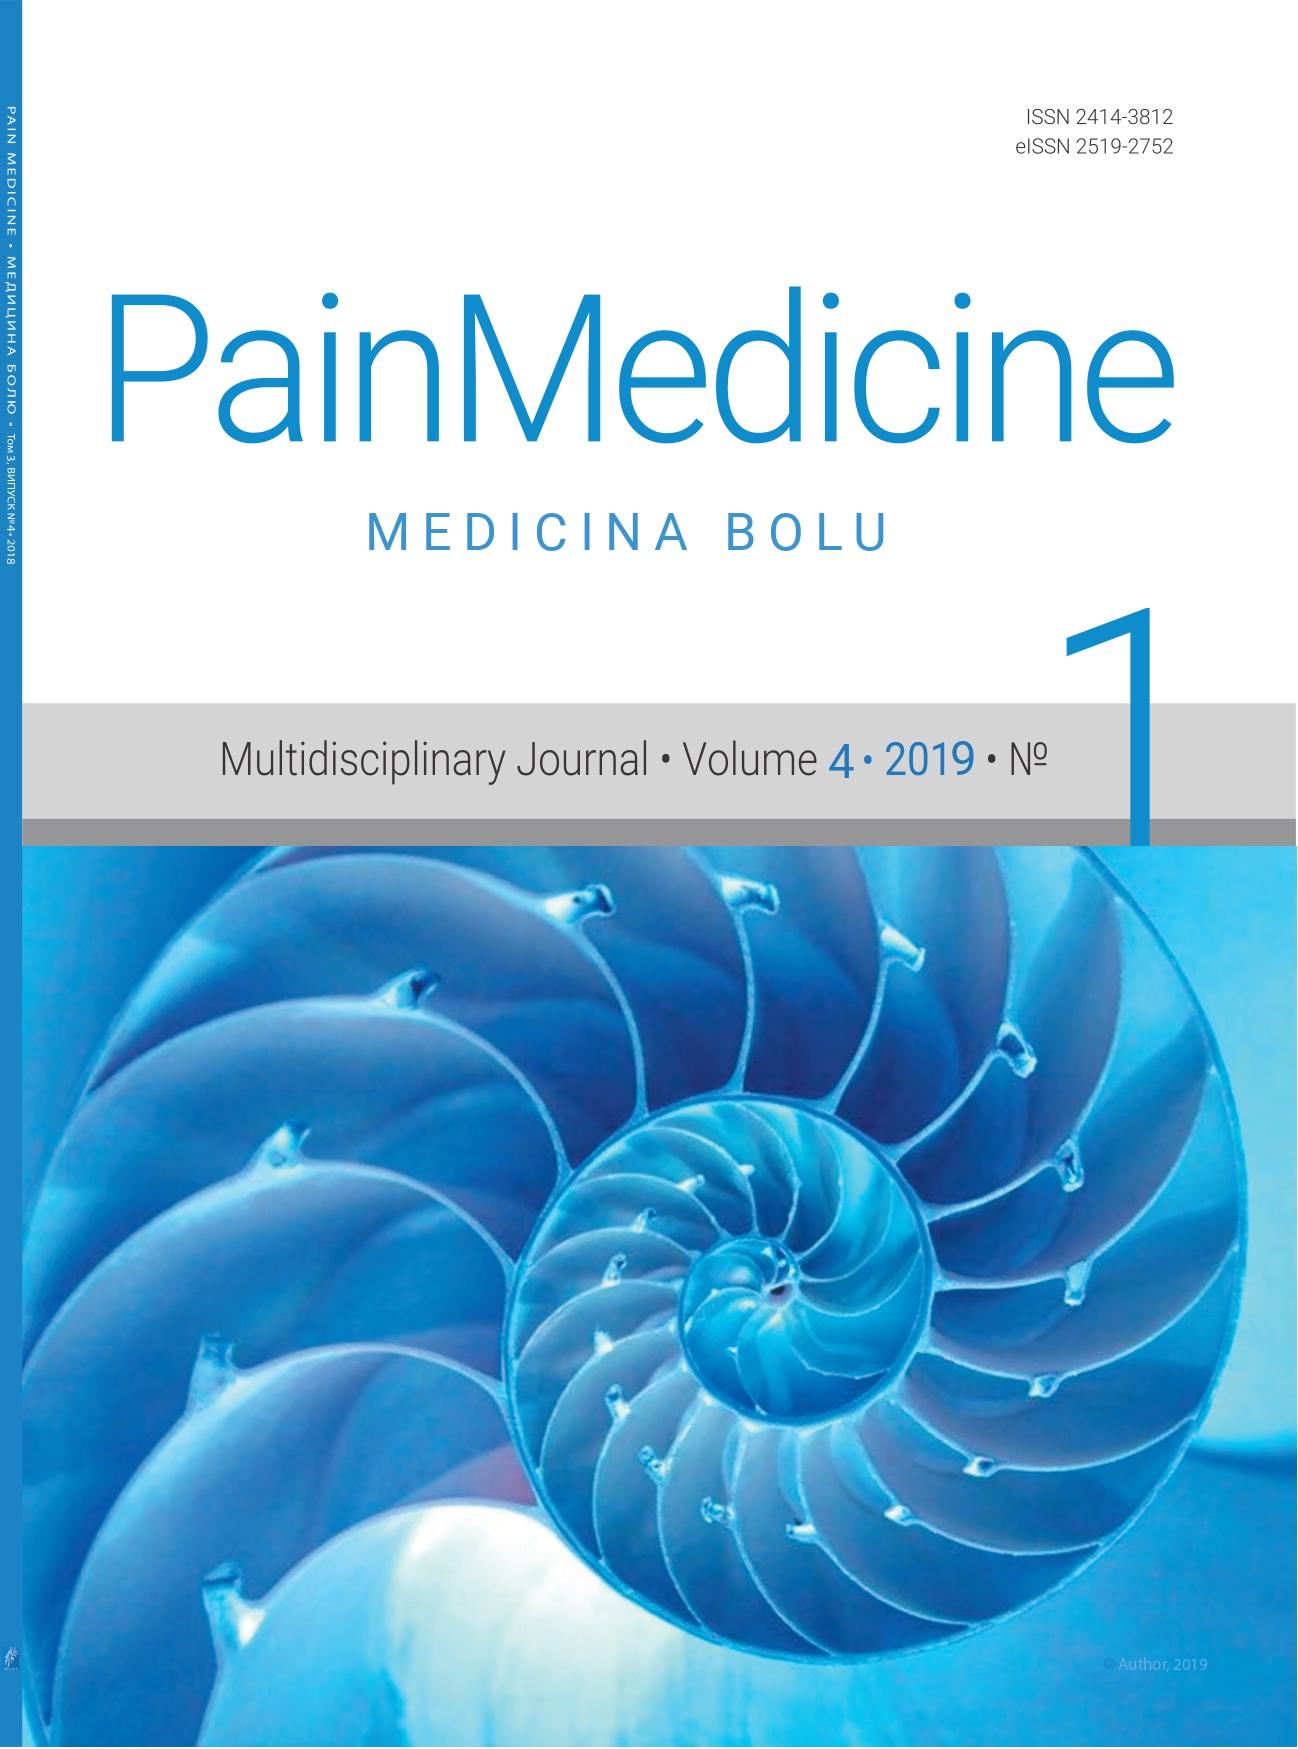 View Vol. 4 No. 1 (2019): Pain medicine